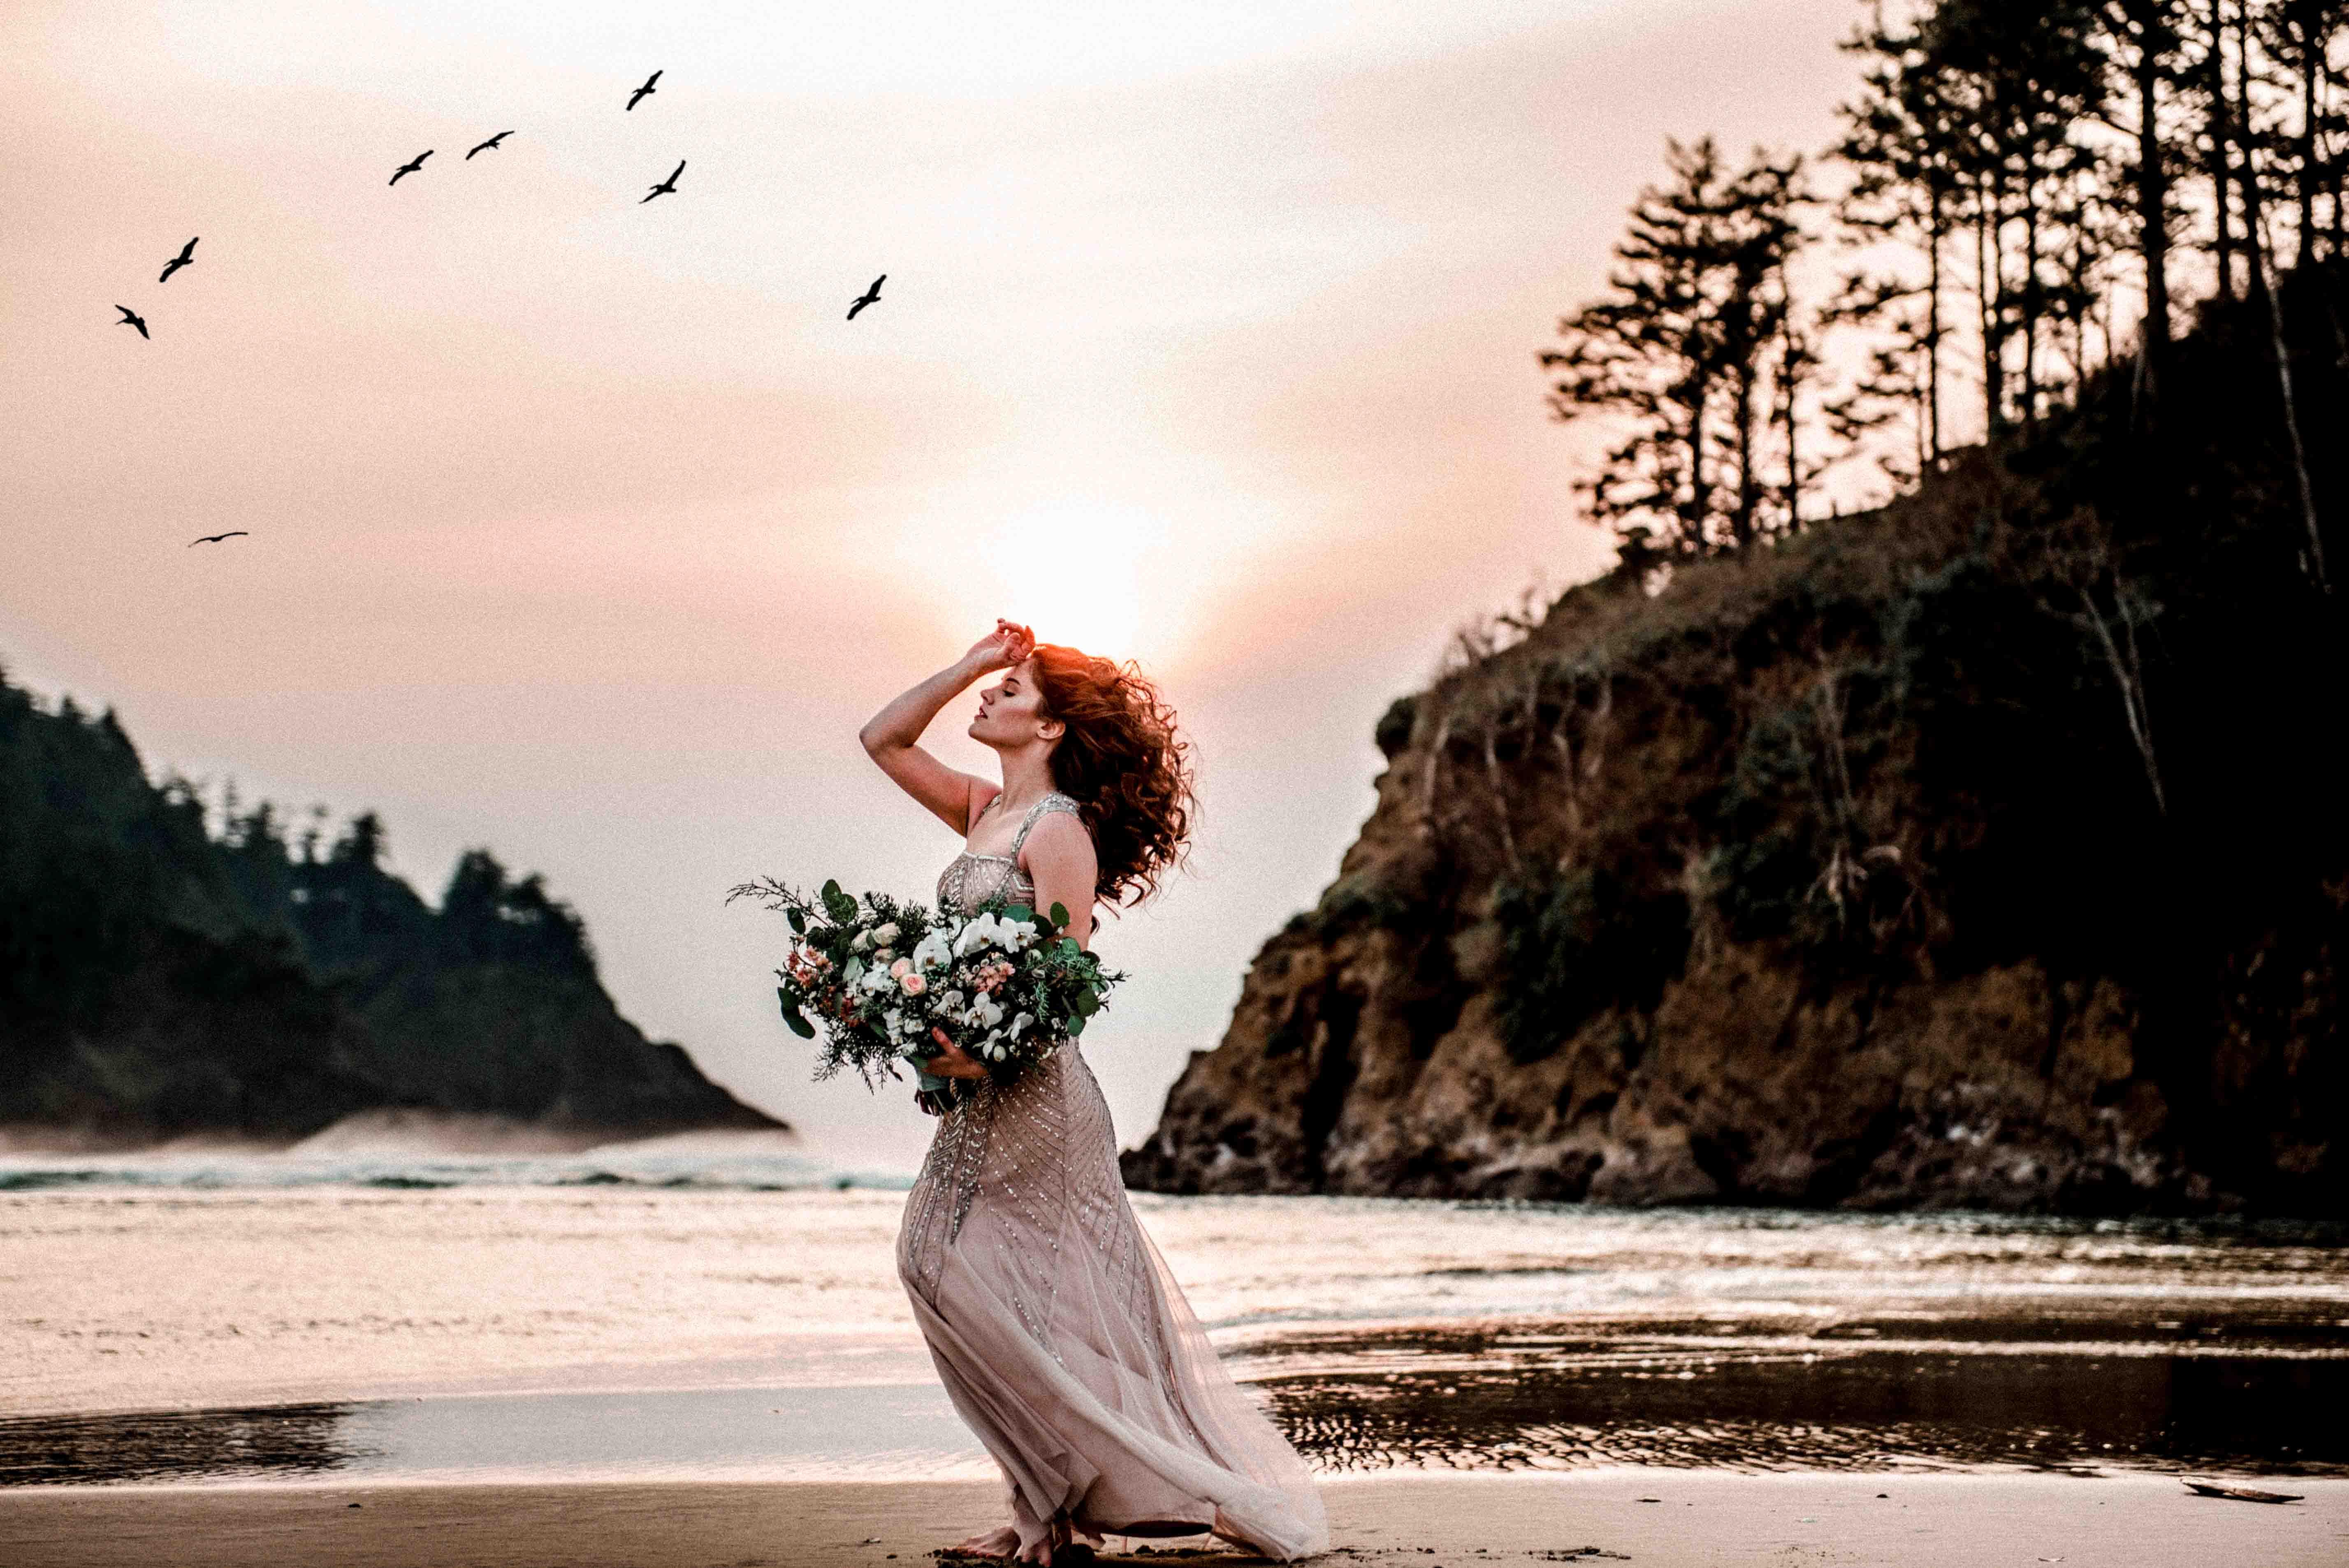 Bride portrait on the Oregon coast by Dionne Kraus Photography